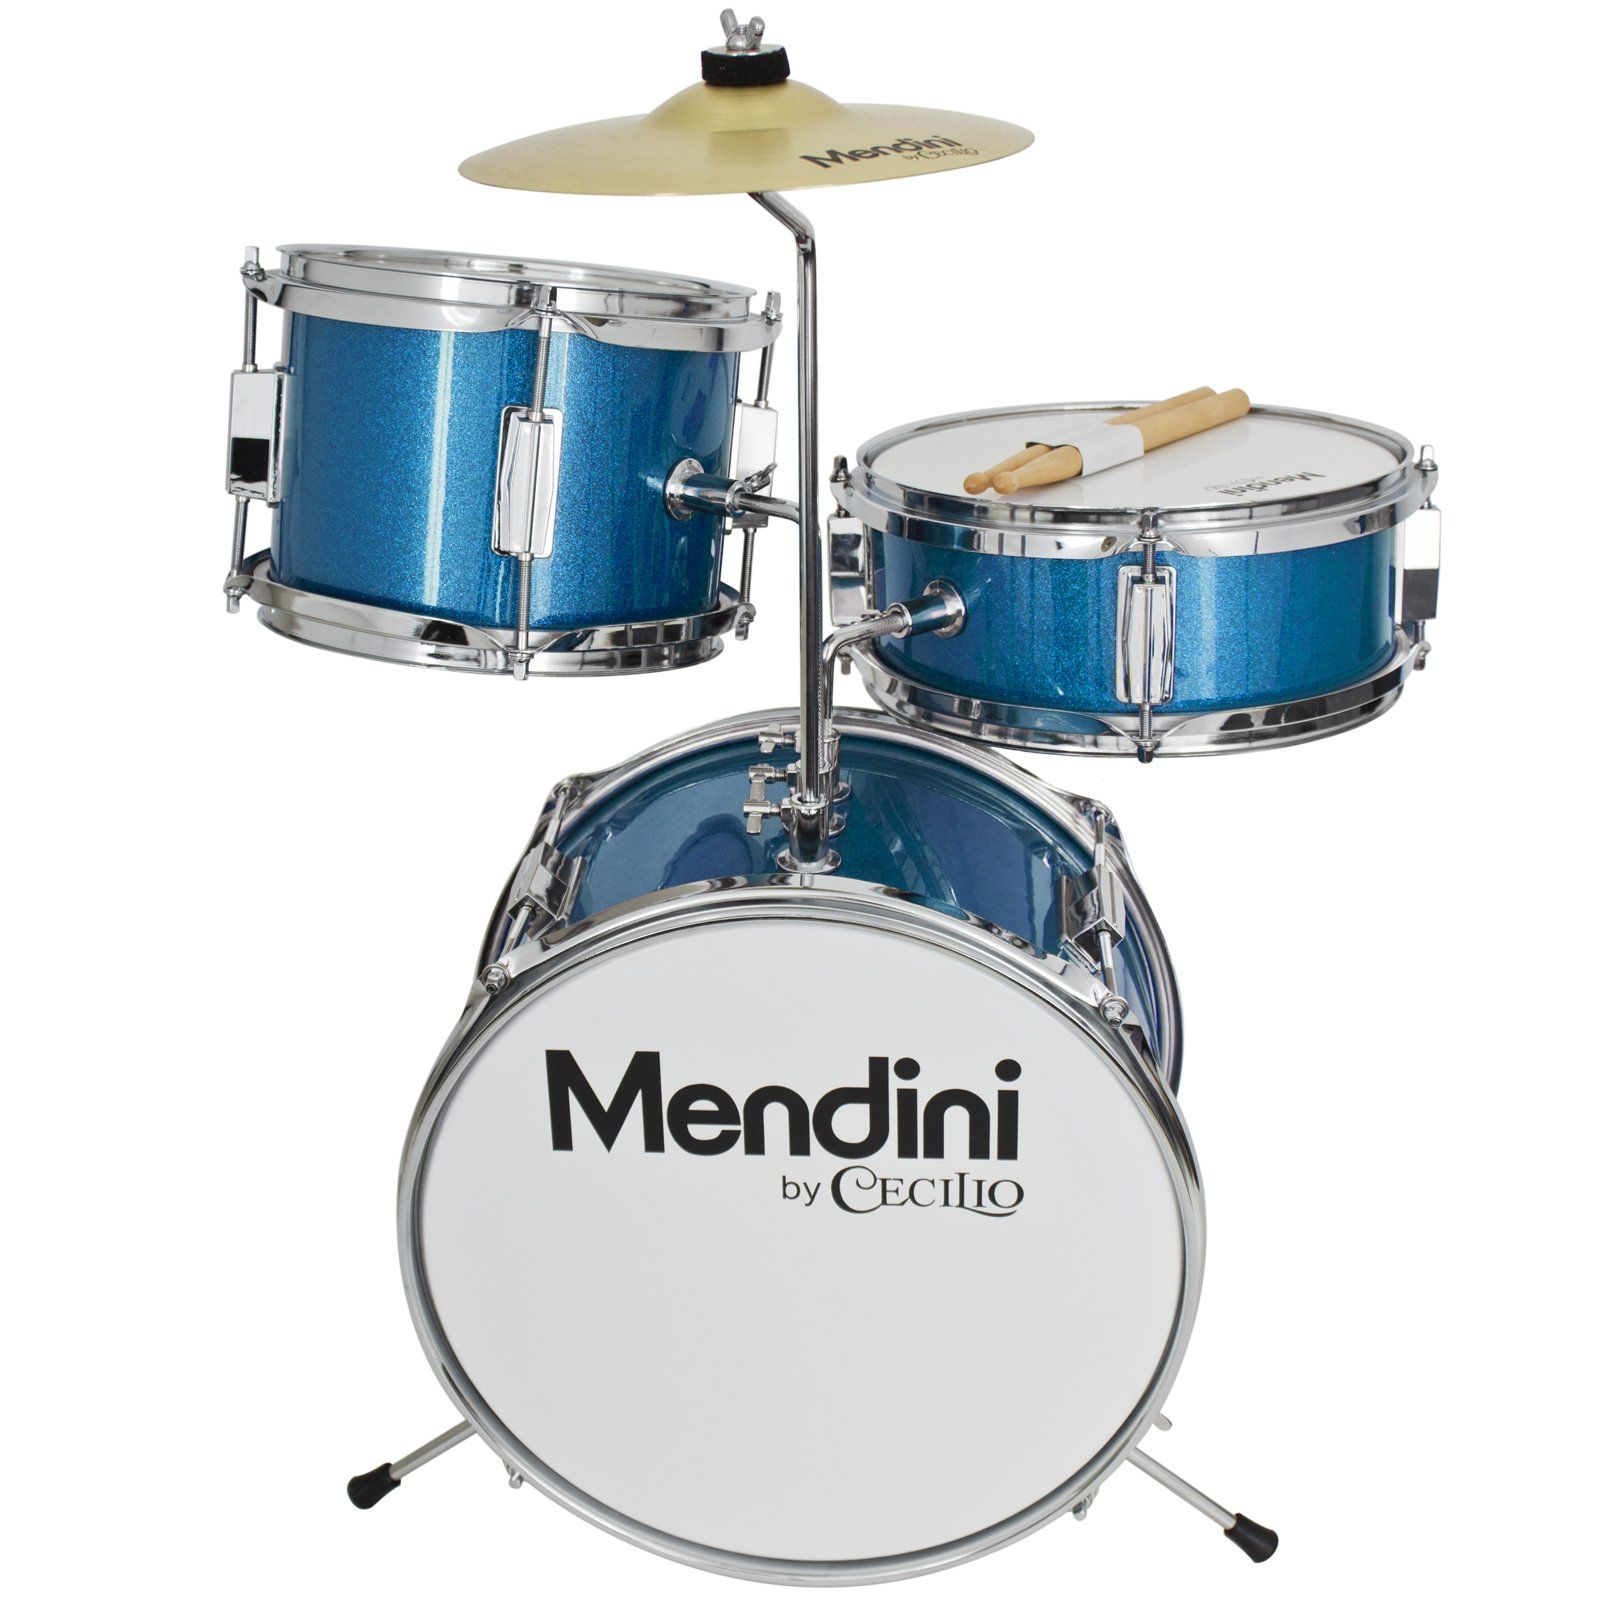 Mendini By Cecilio 13 Inch 3 Piece Kids Junior Drum Set With 1 Adjustable Throne